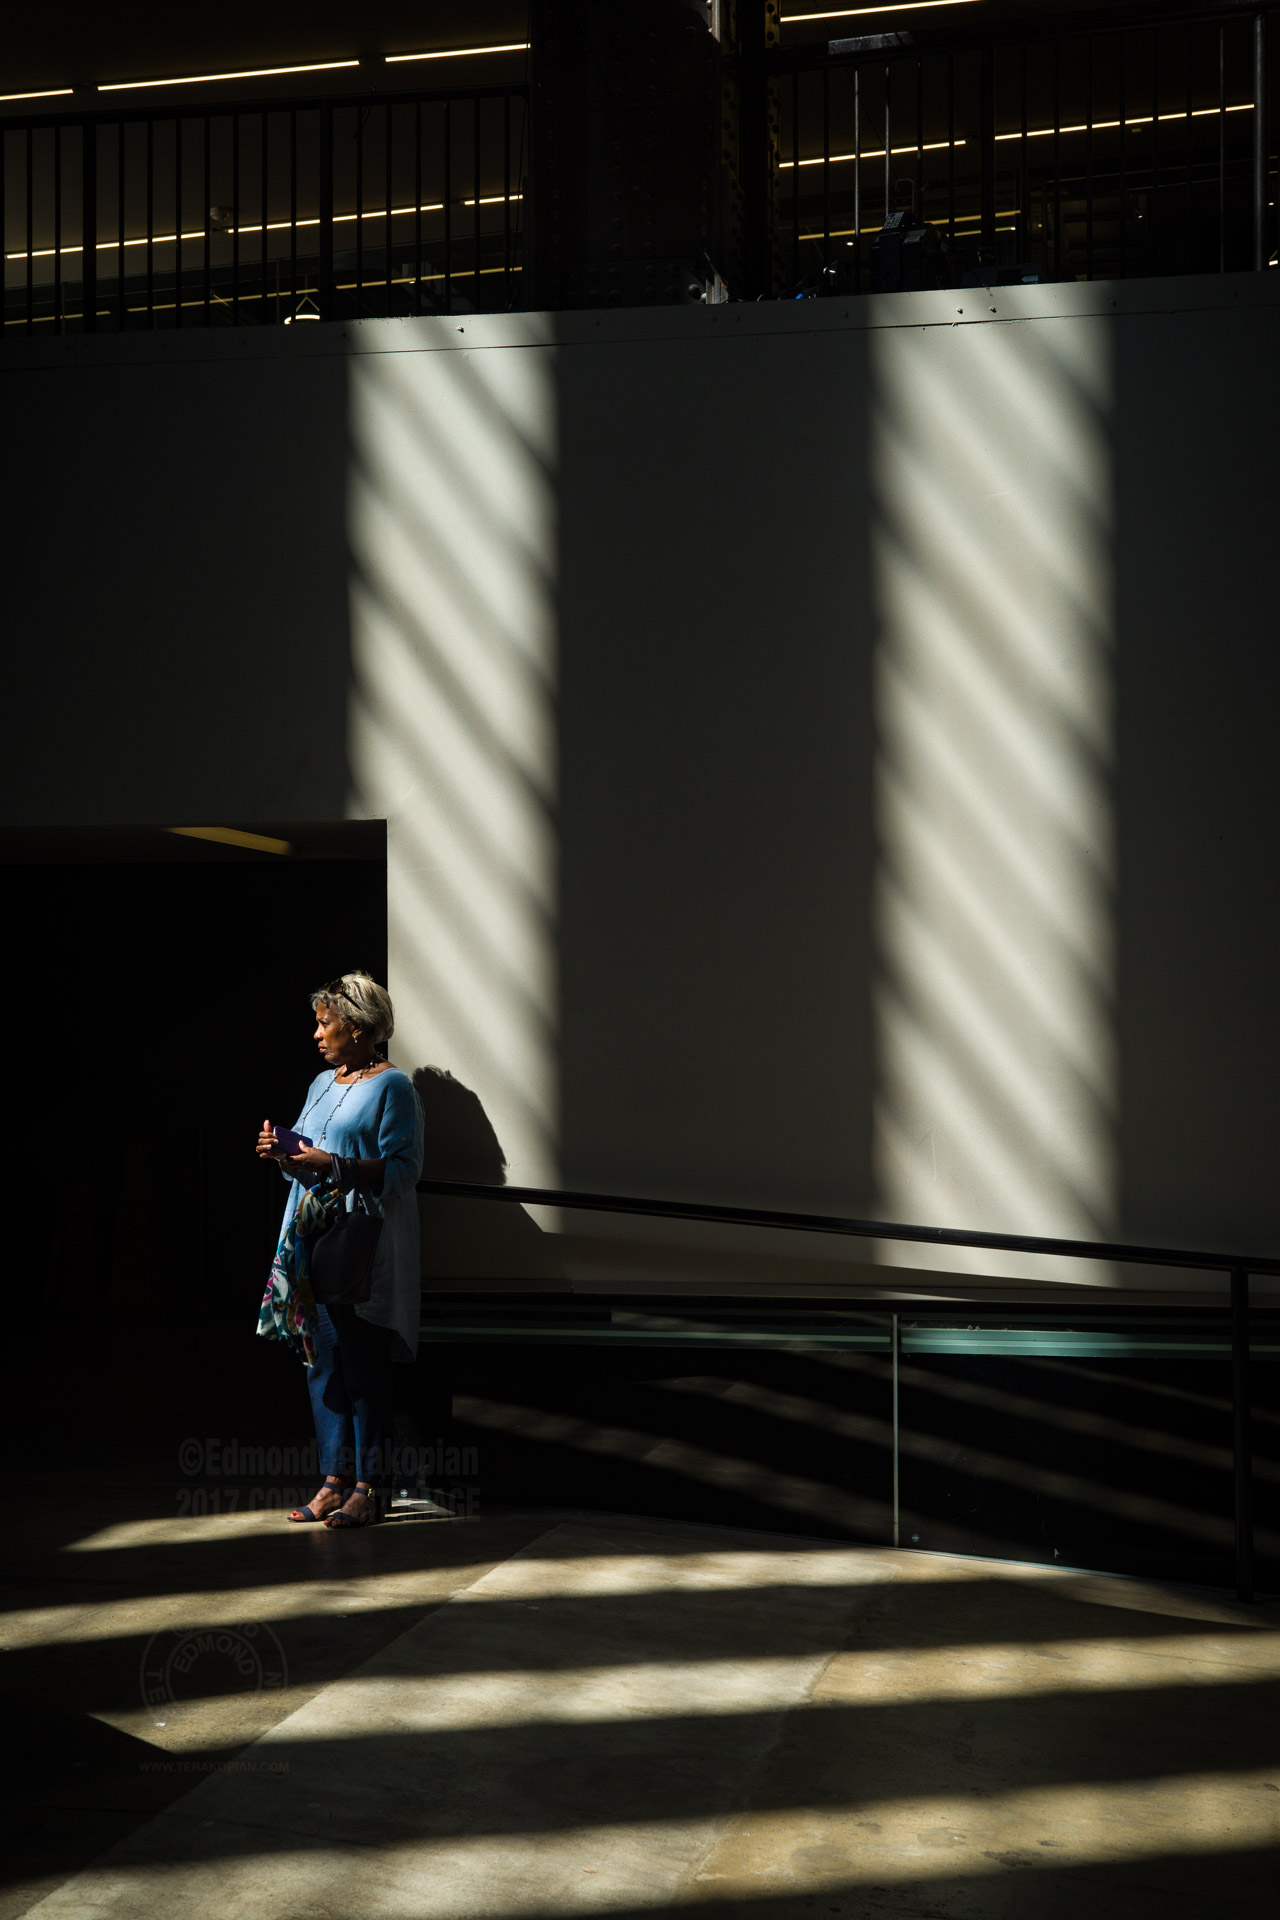 Tate Modern, Bankside, London. August 01, 2017. Photo: Edmond Terakopian